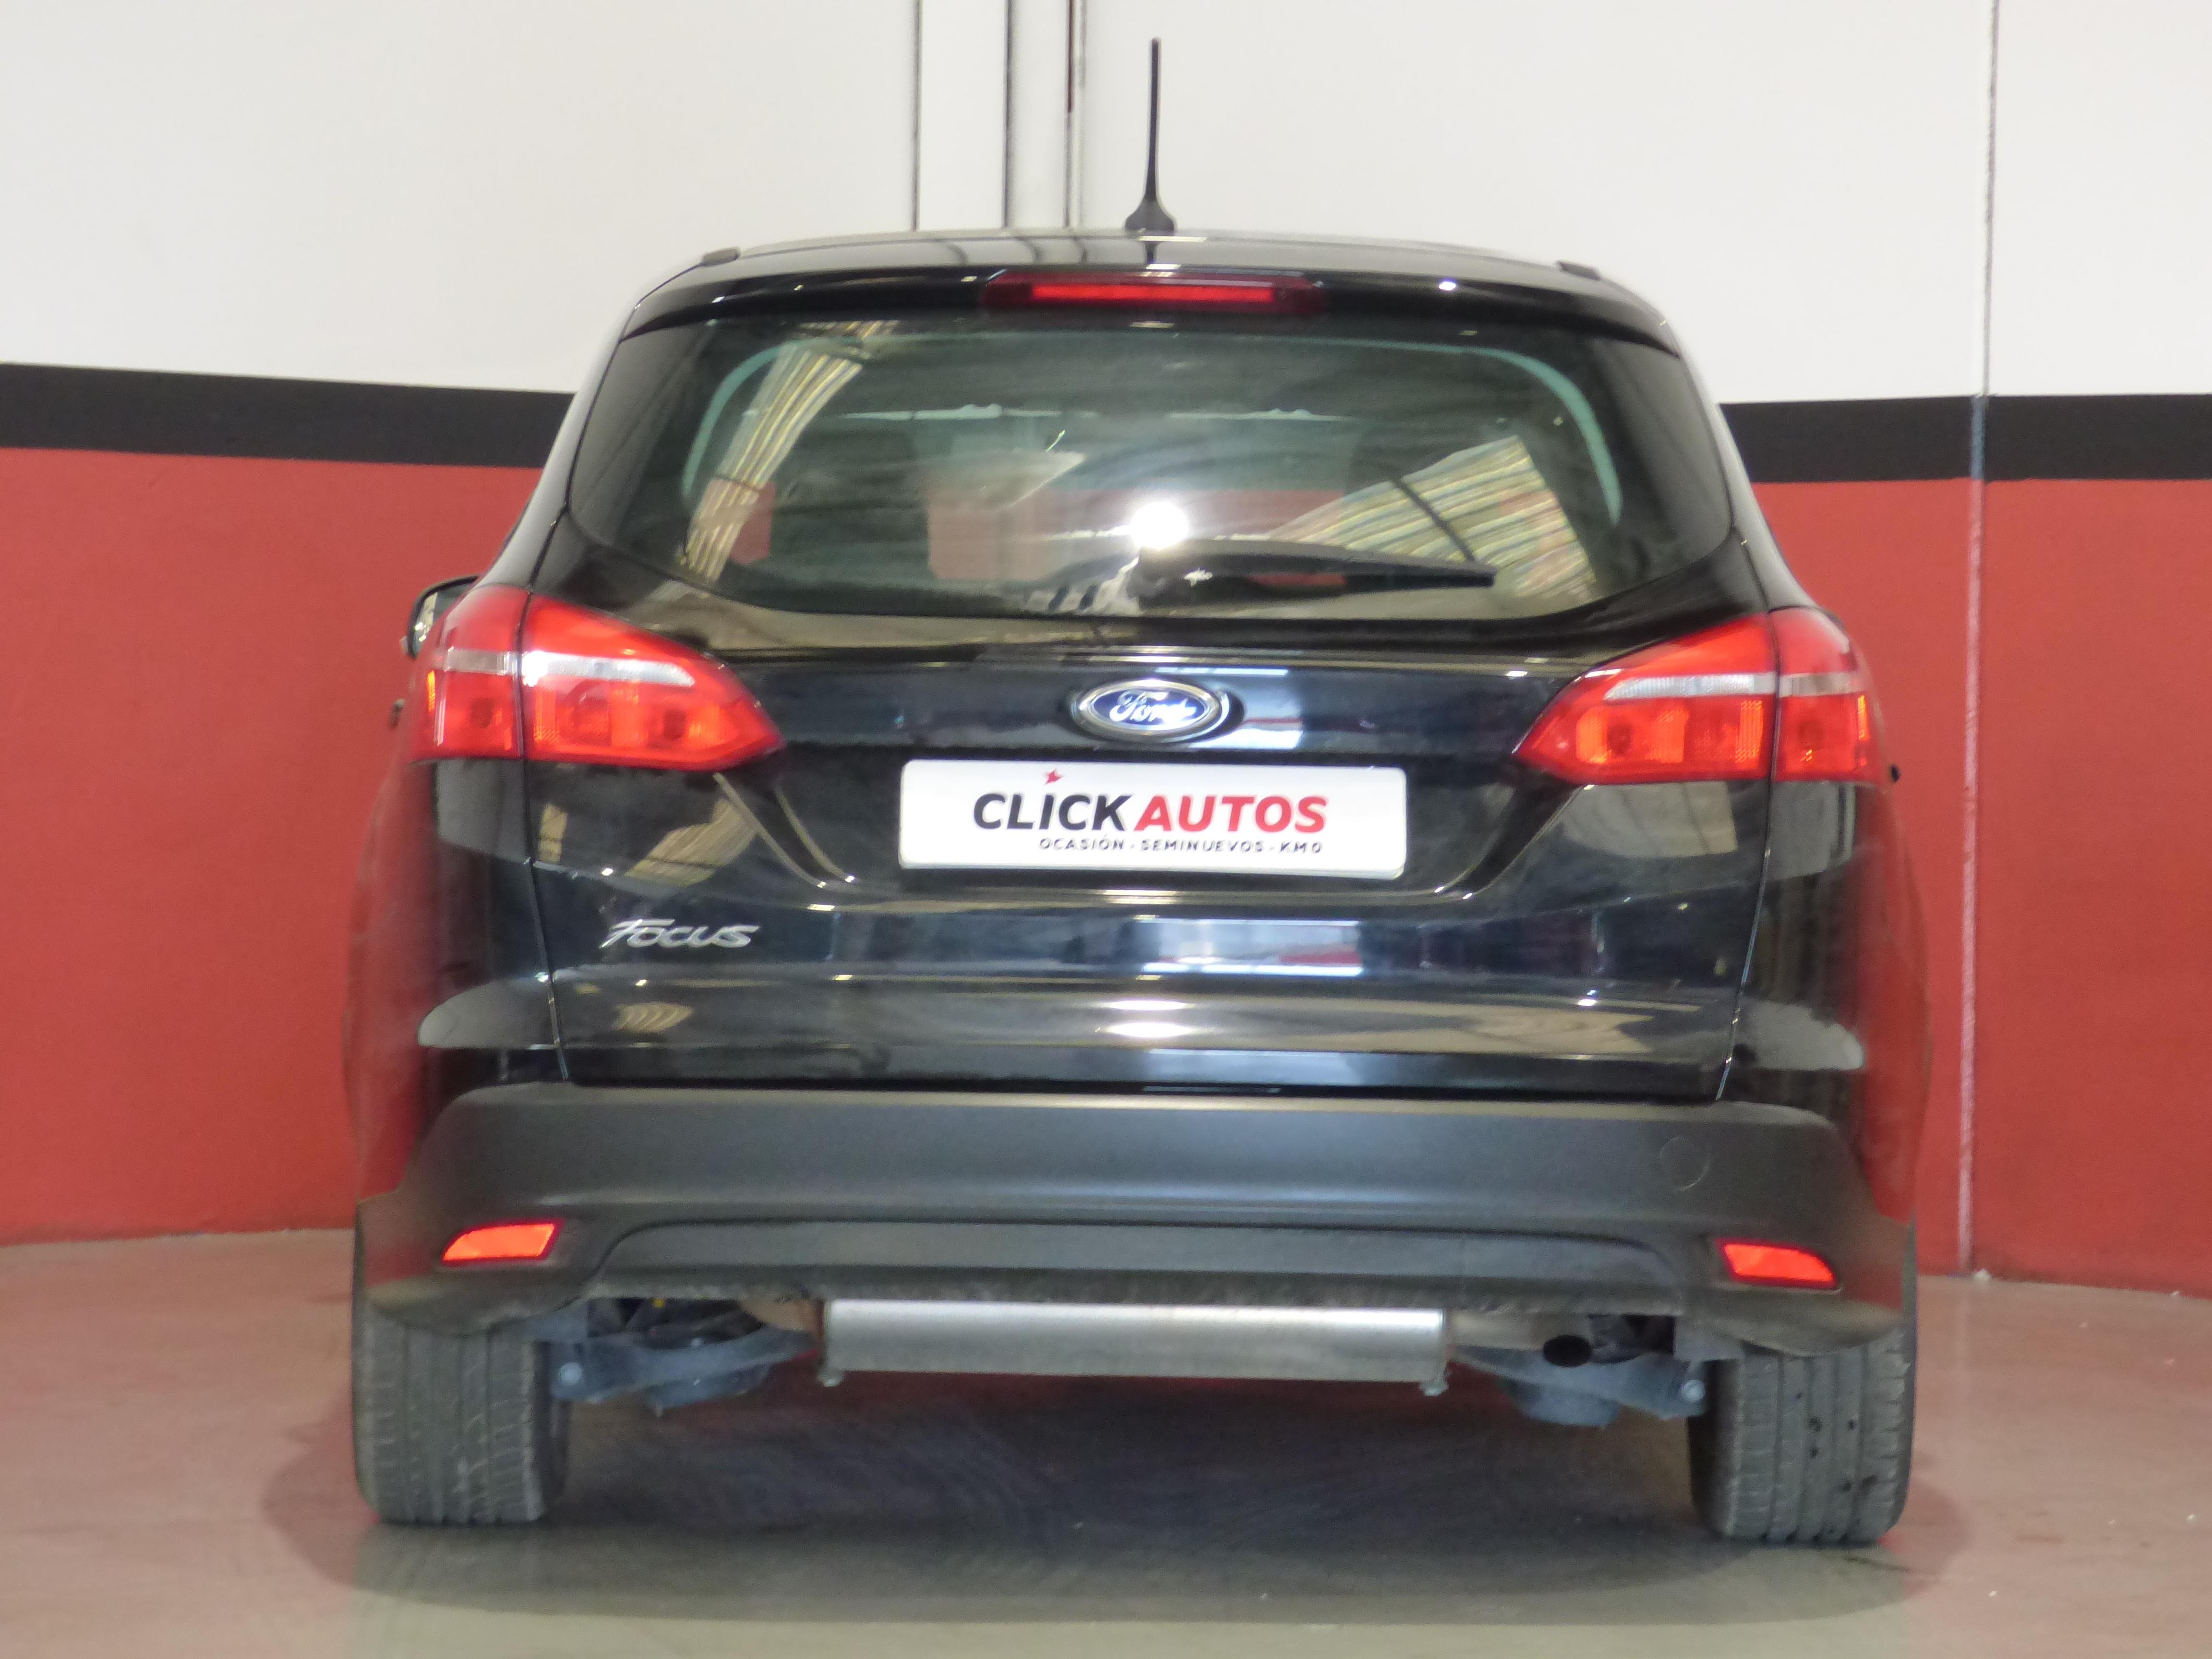 Focus Sportbreak 1.6 TIVCT 125CV Trend+ automatico 5